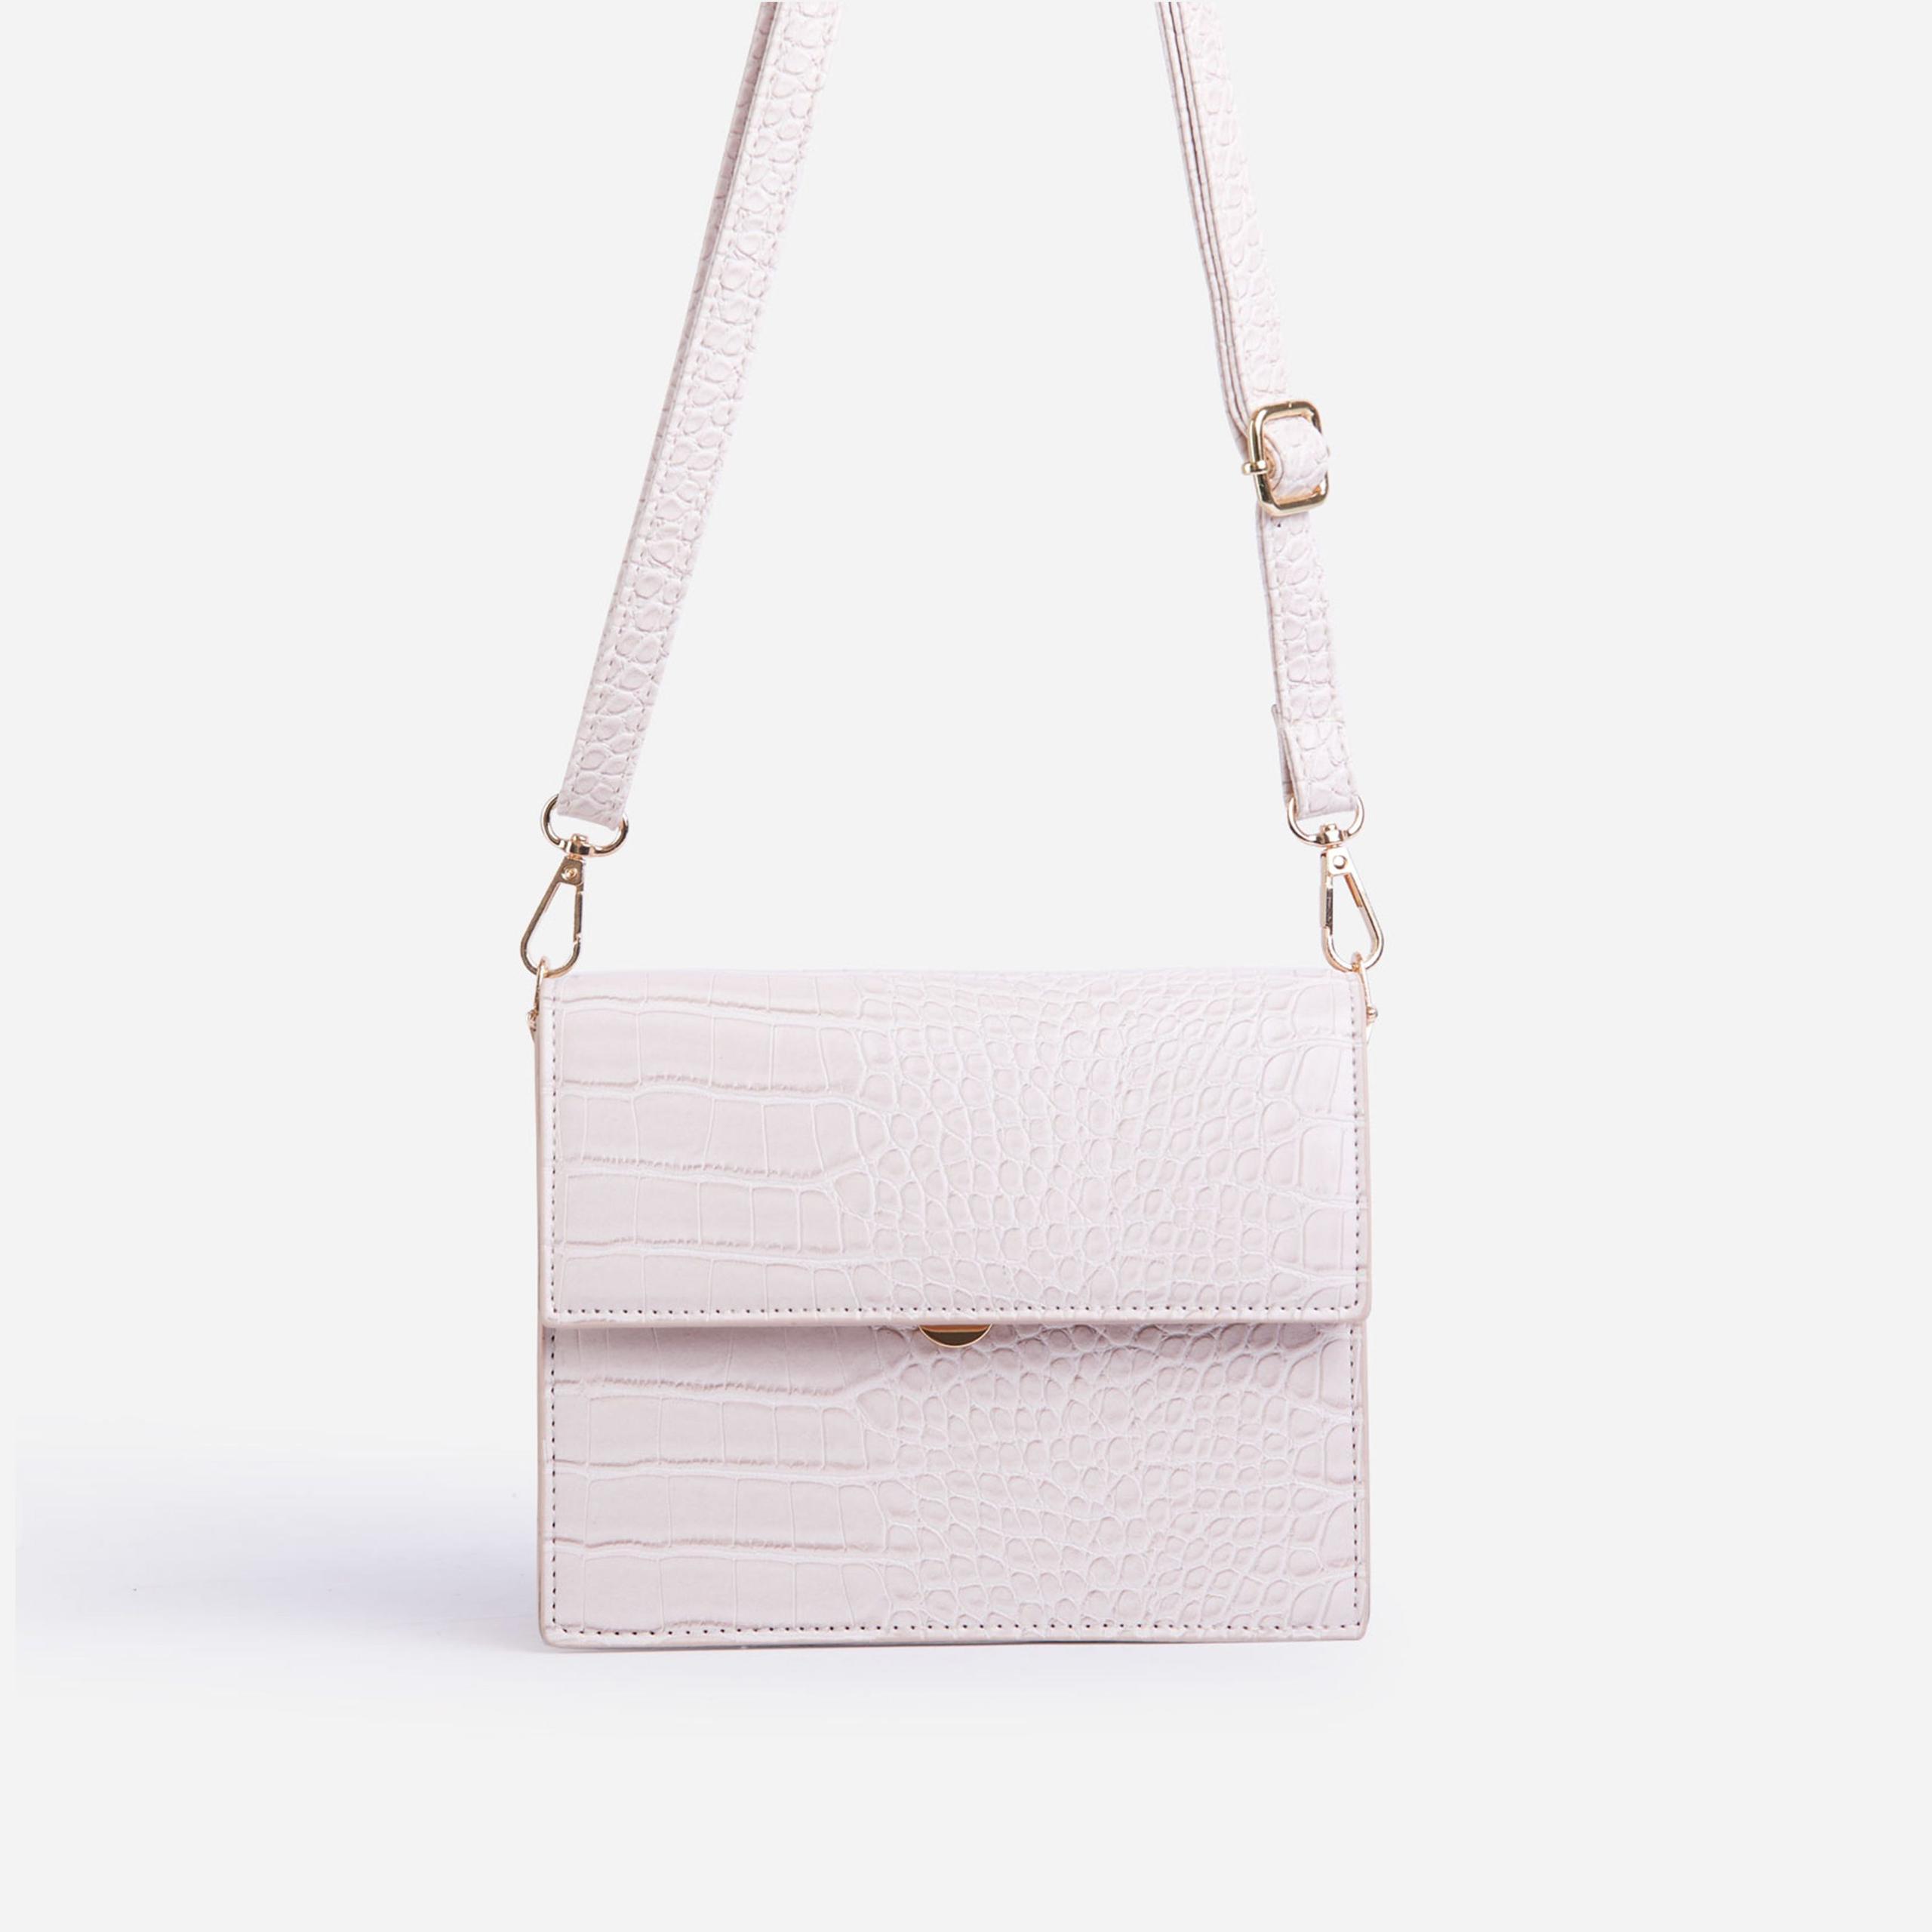 Belle Boxy Shoulder Bag In White Croc Print Patent